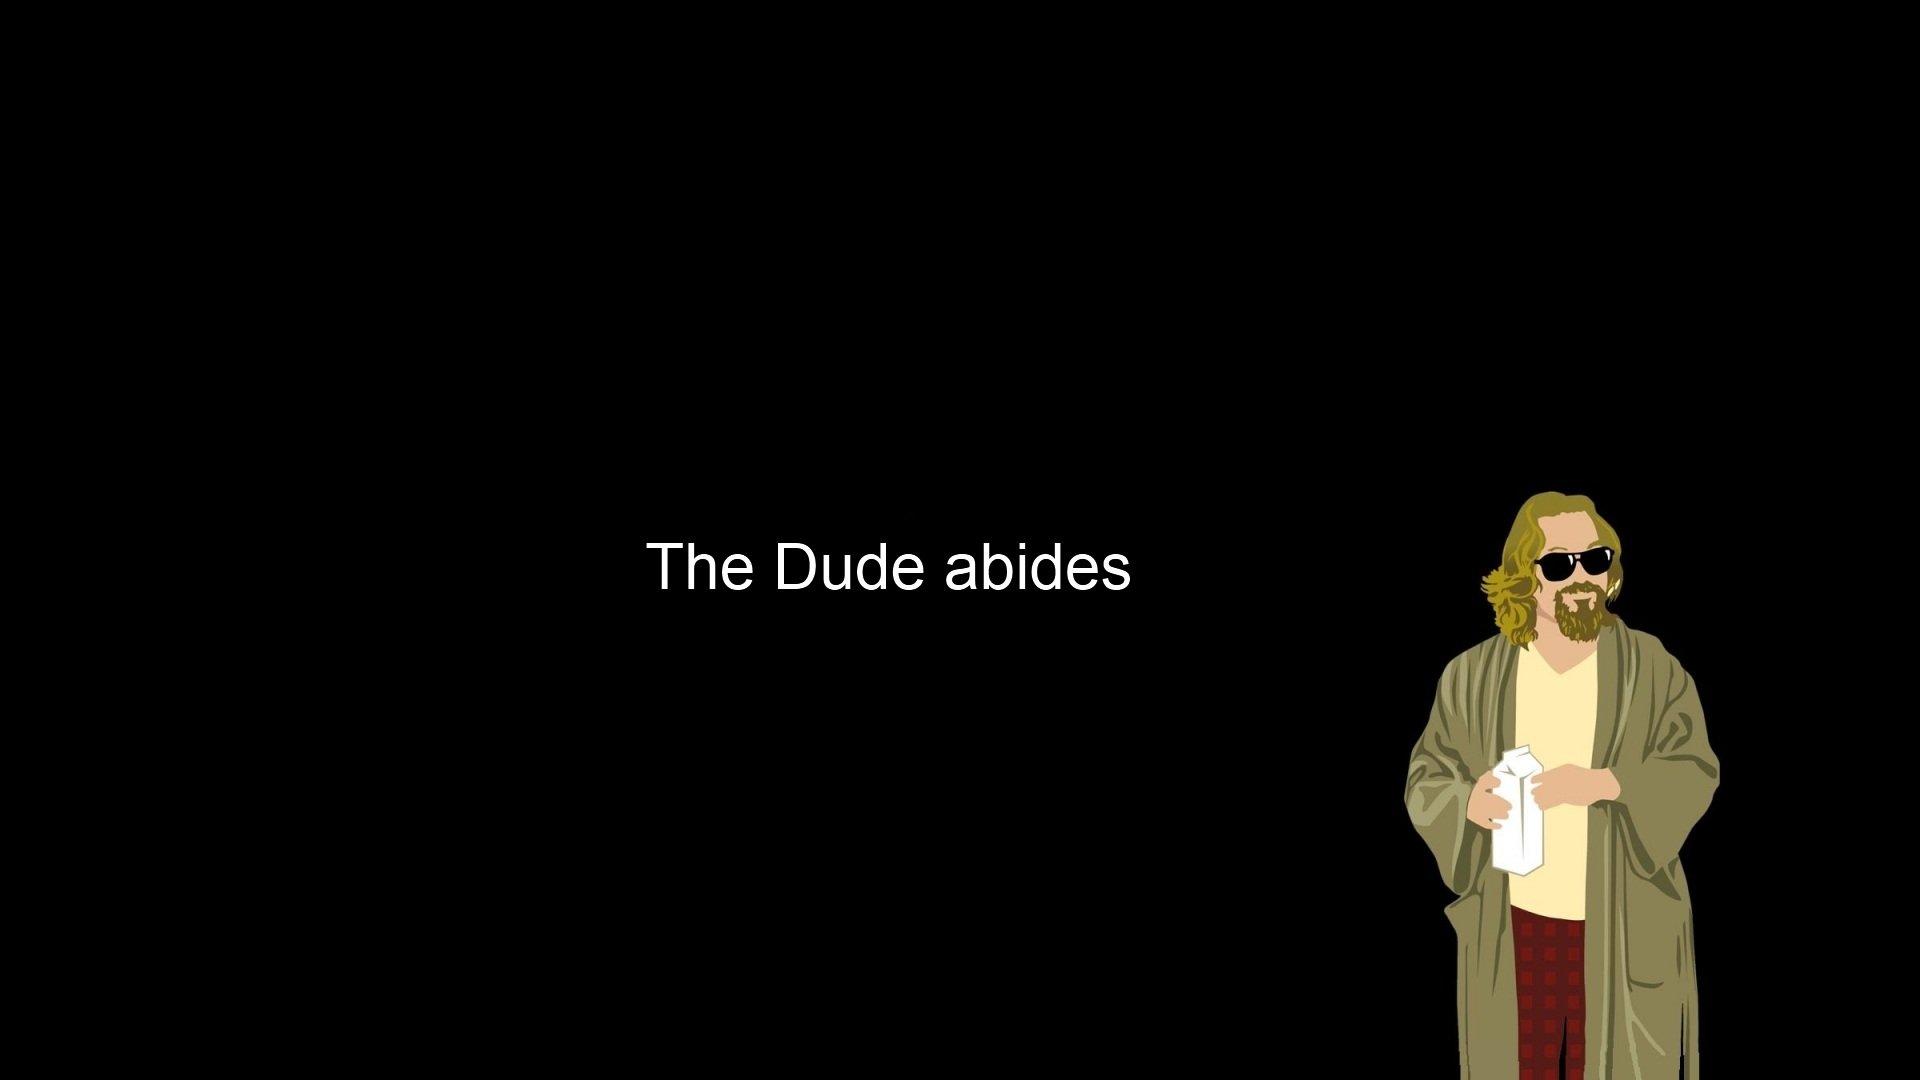 Minimalistic The Dude The Big Lebowski wallpaper 1920x1080